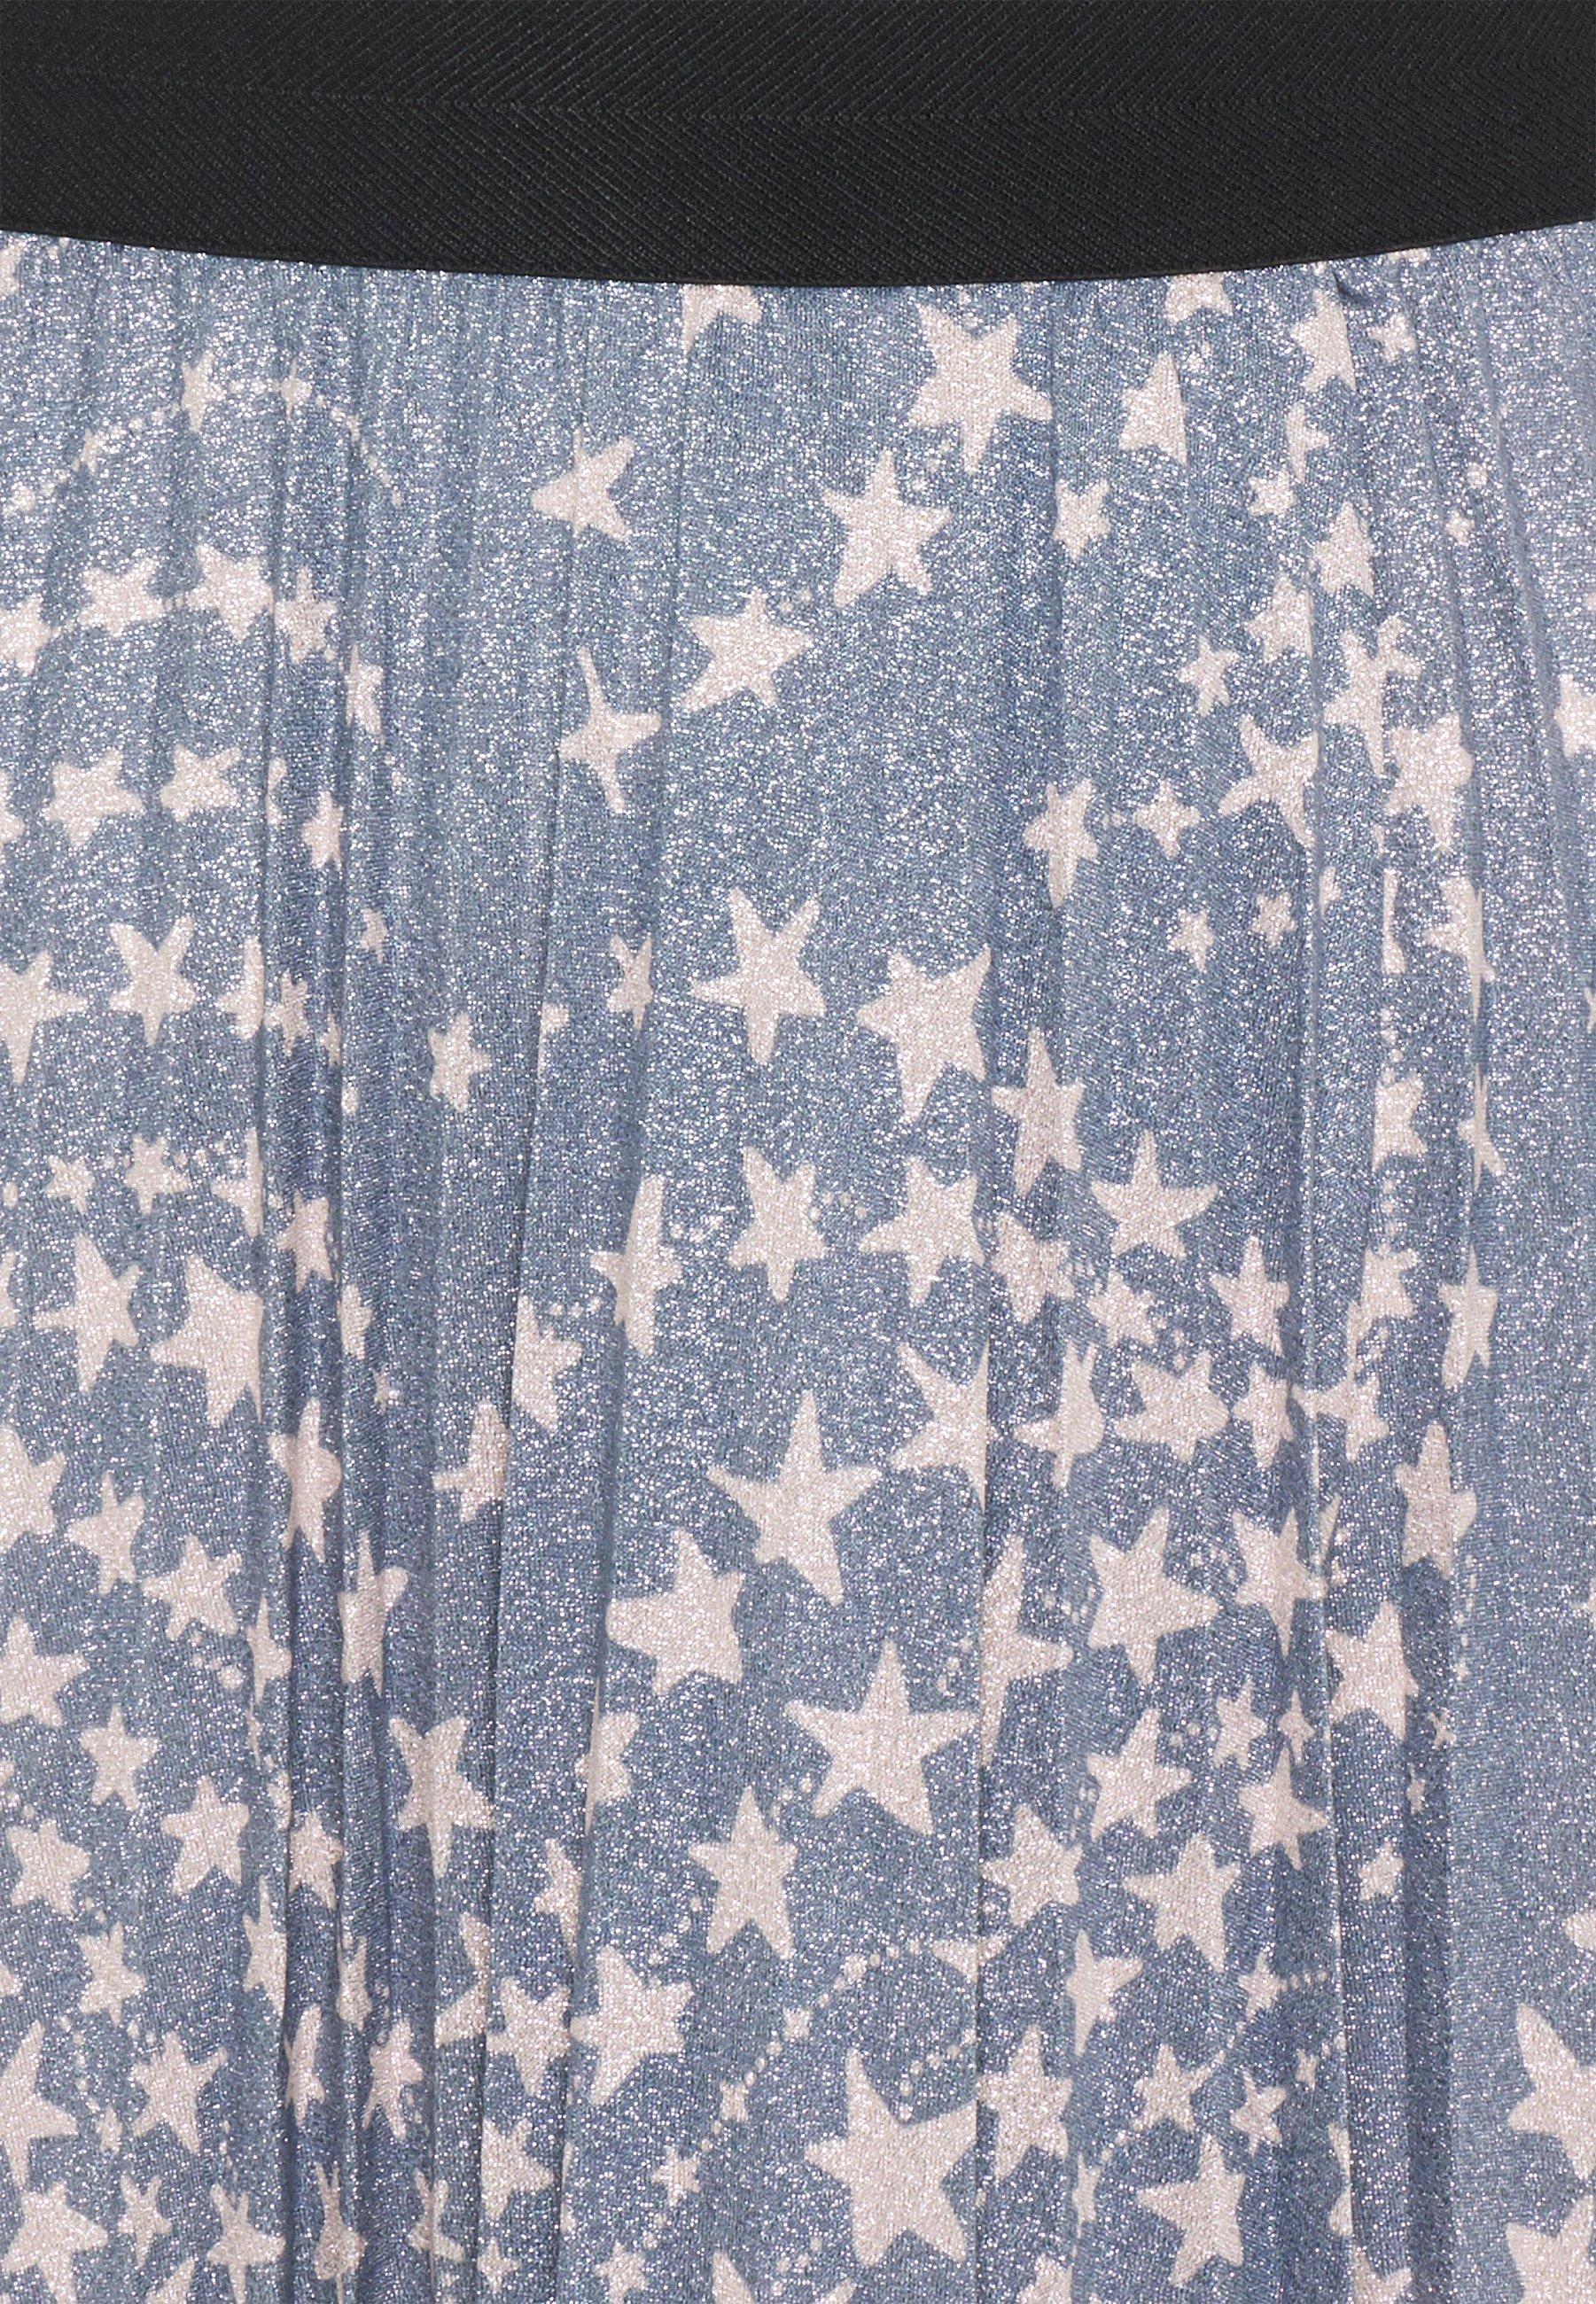 Hyper Online Women's Clothing By Malene Birger LYANNA A-line skirt faded dove z2Rs4Dw2U